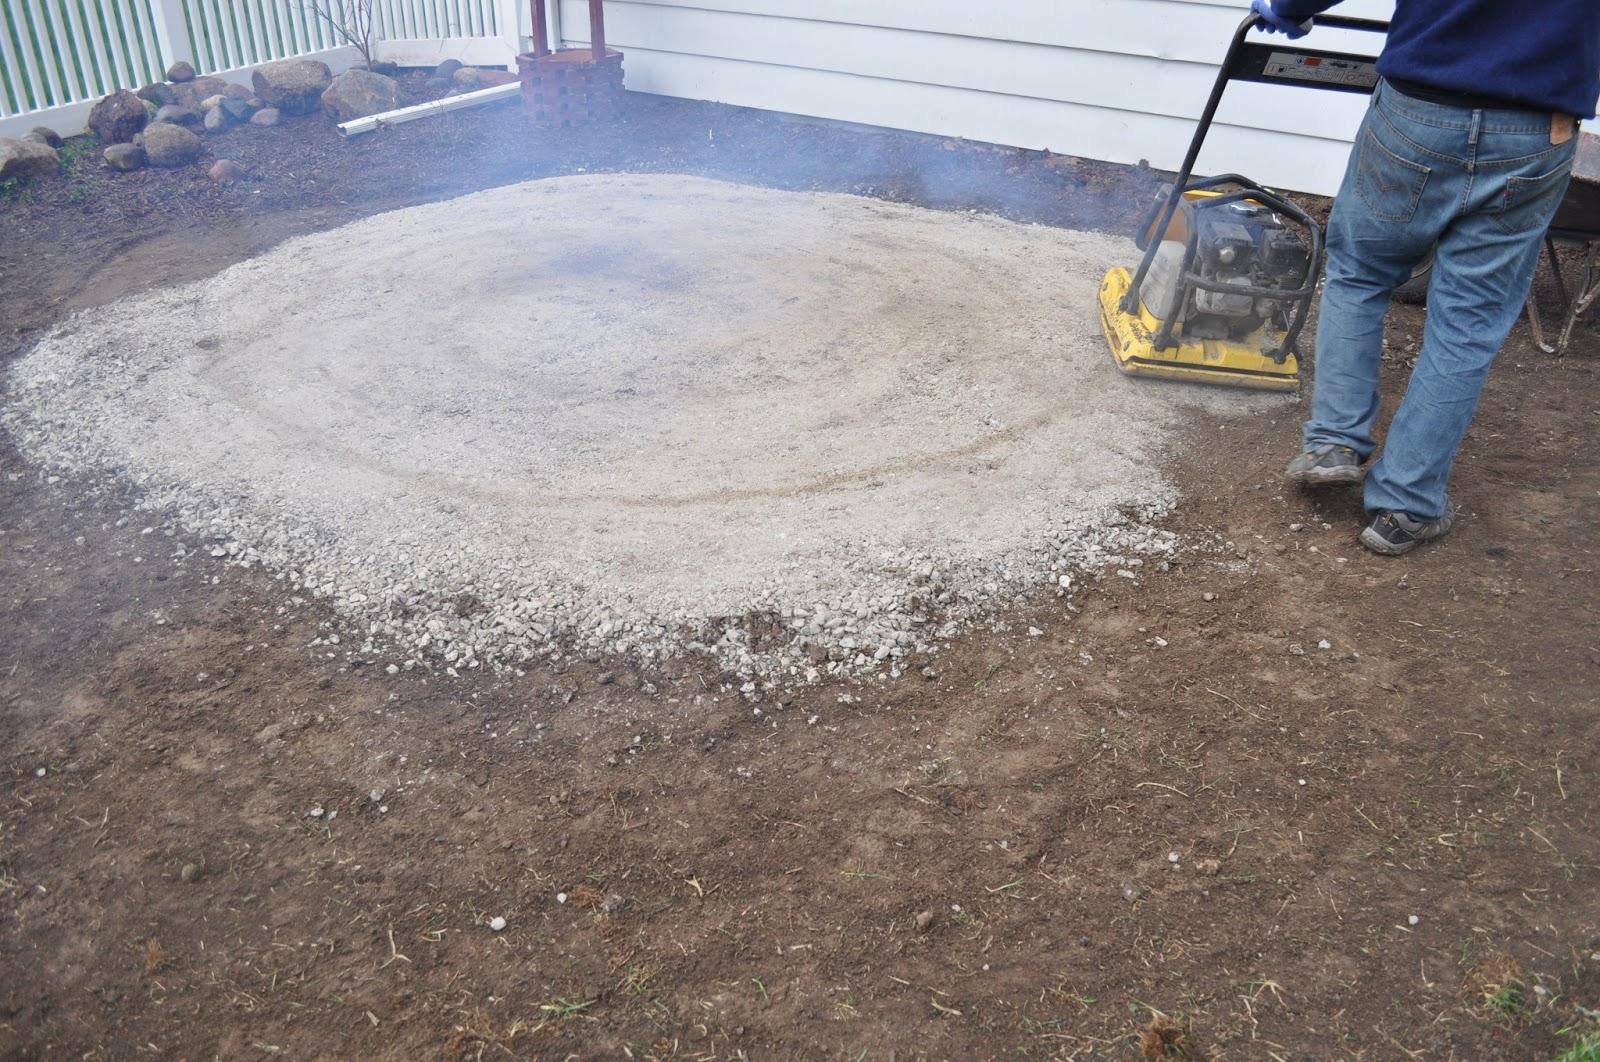 Pea Gravel Patio Diy : mulch, sod cutter, patio, pavers, DIY, landscaping, reno, pea gravel